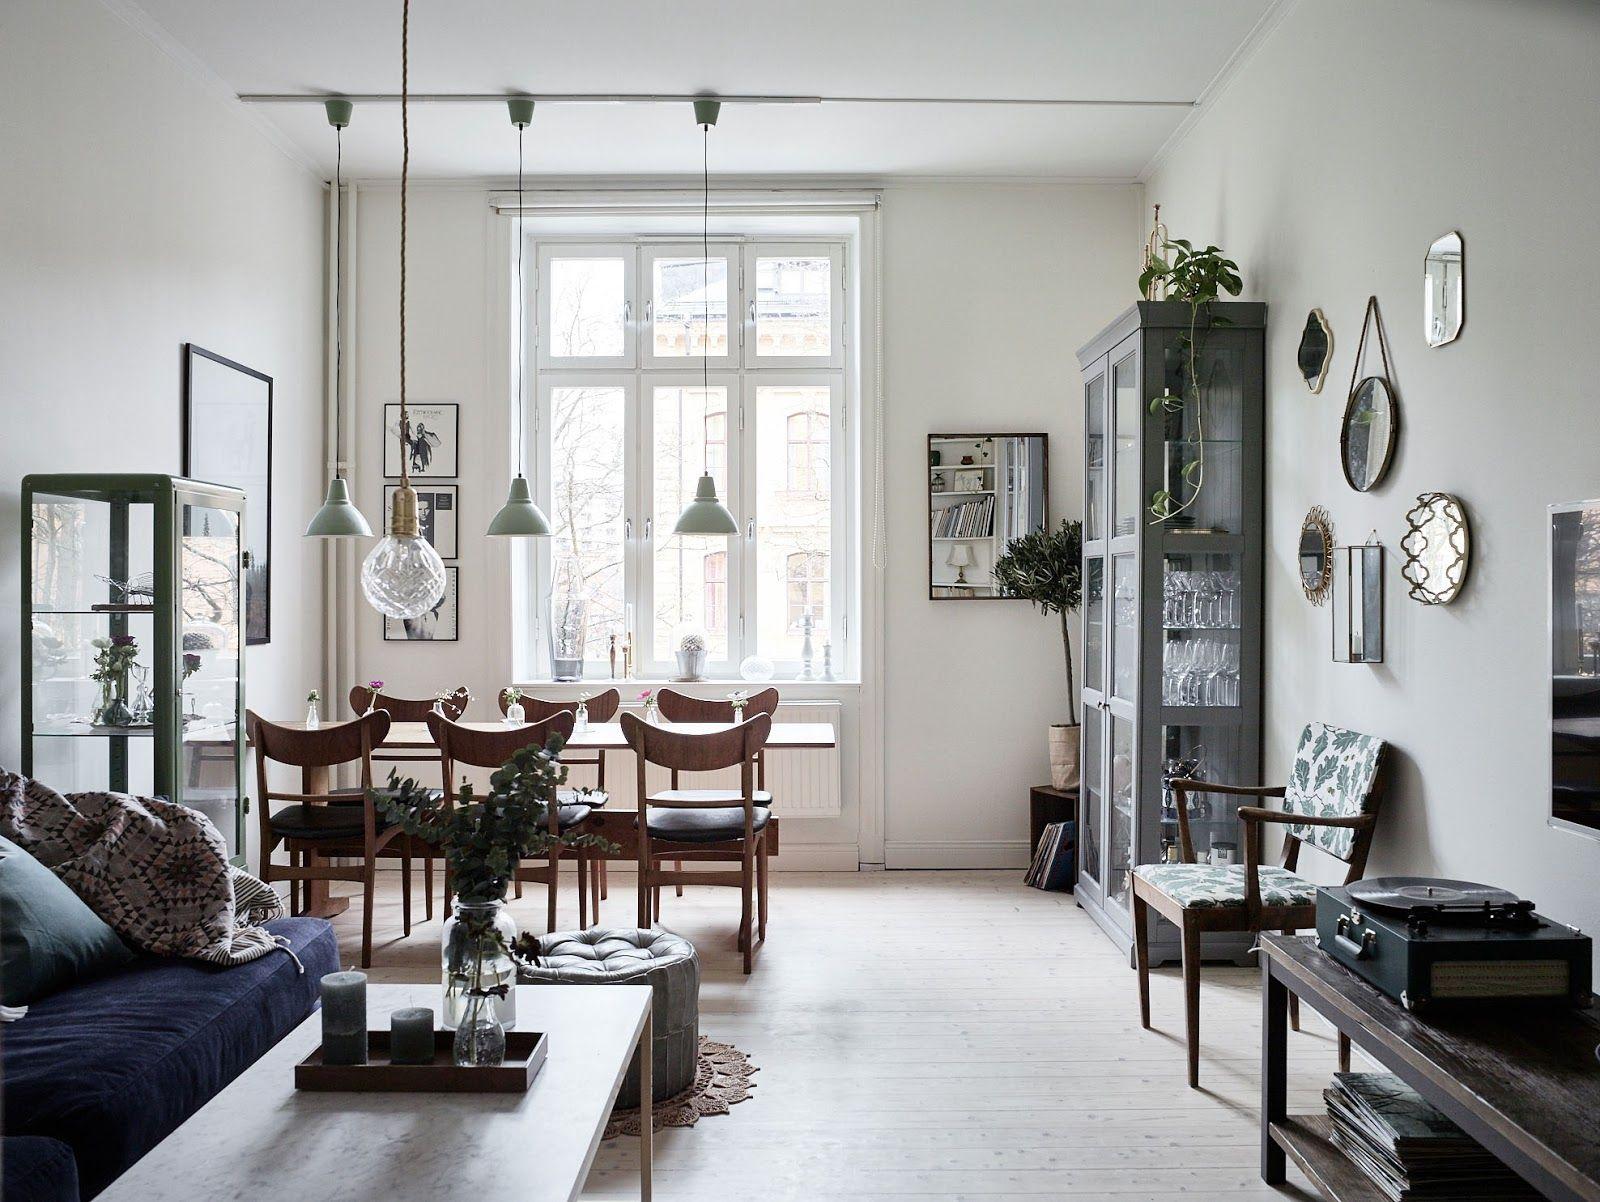 Wohnkultur esszimmer decordemon the blog  a daily dose of stunning interiors